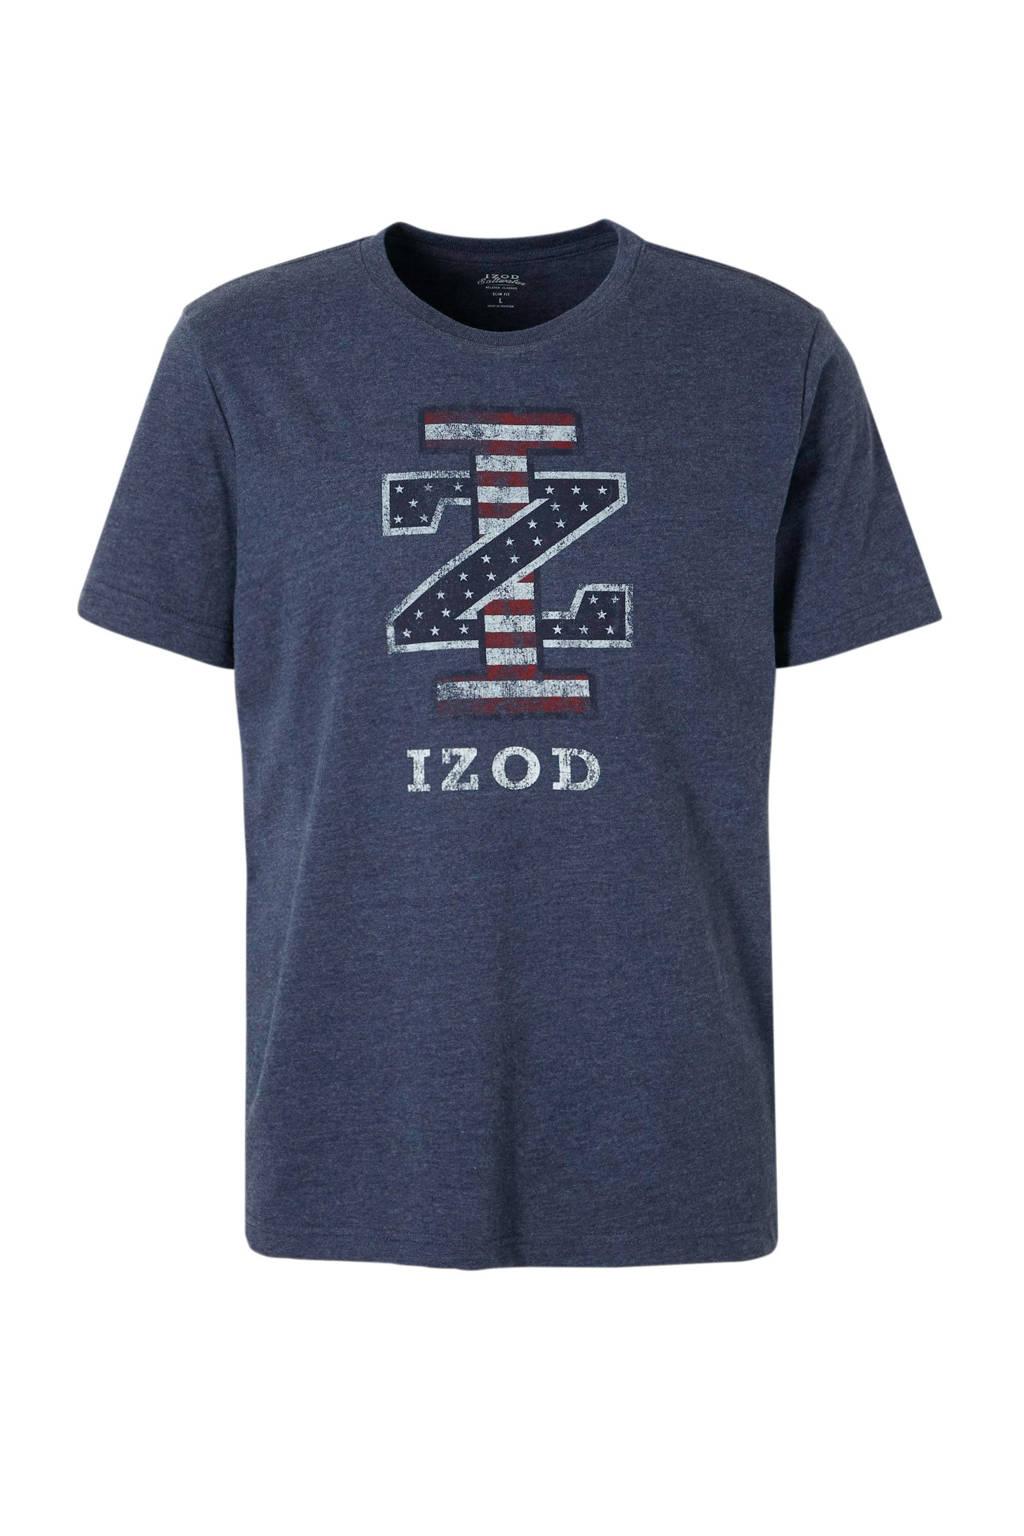 IZOD gemêleerd T-shirt met print donkerblauw, Donkerblauw